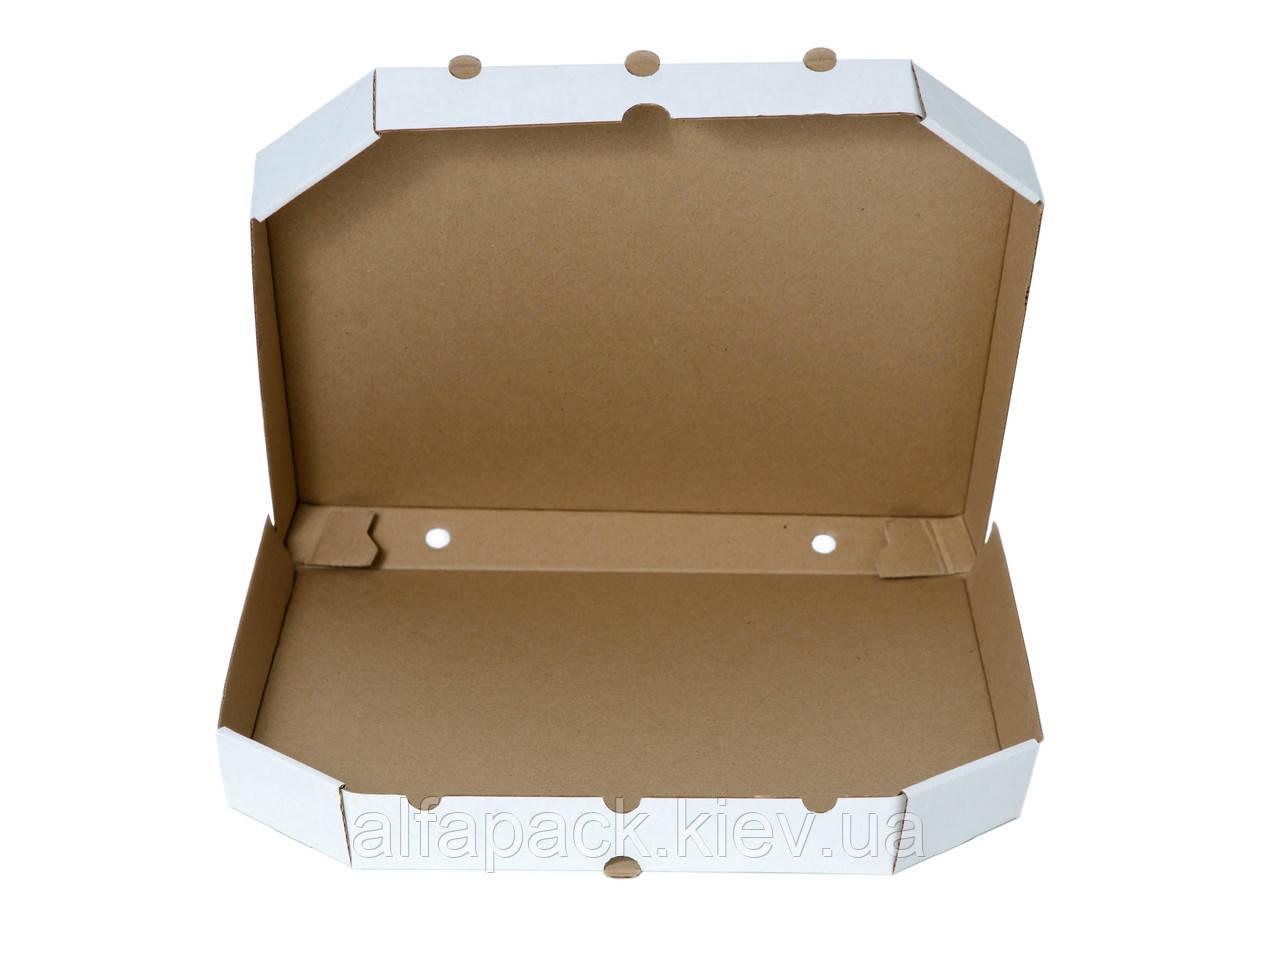 Коробка для пиццы белая D-32, 320х320х37 мм